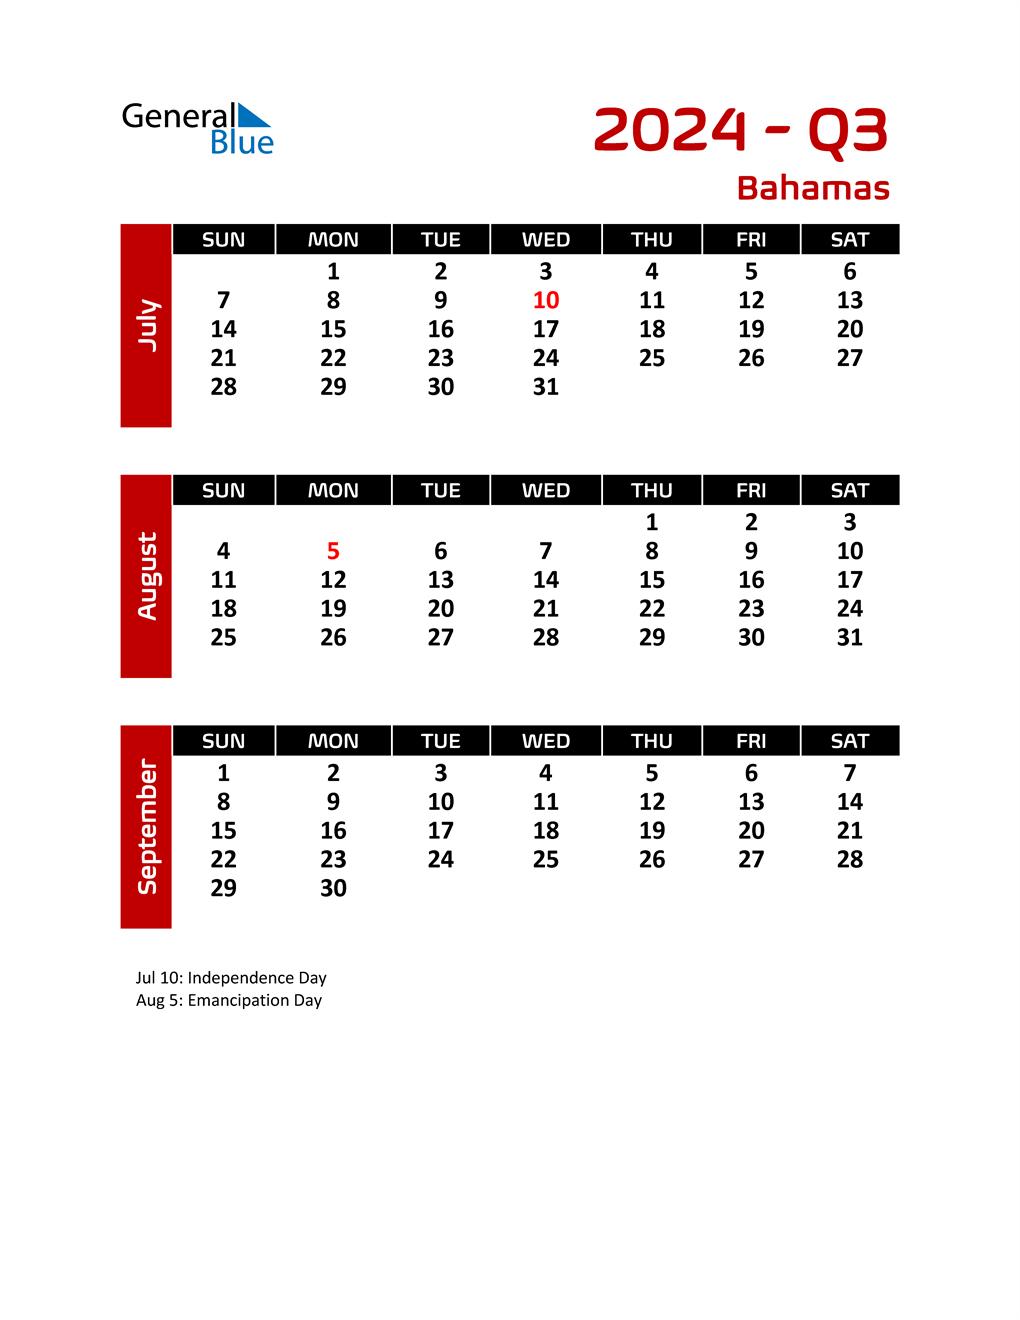 Q3 2024 Calendar with Holidays